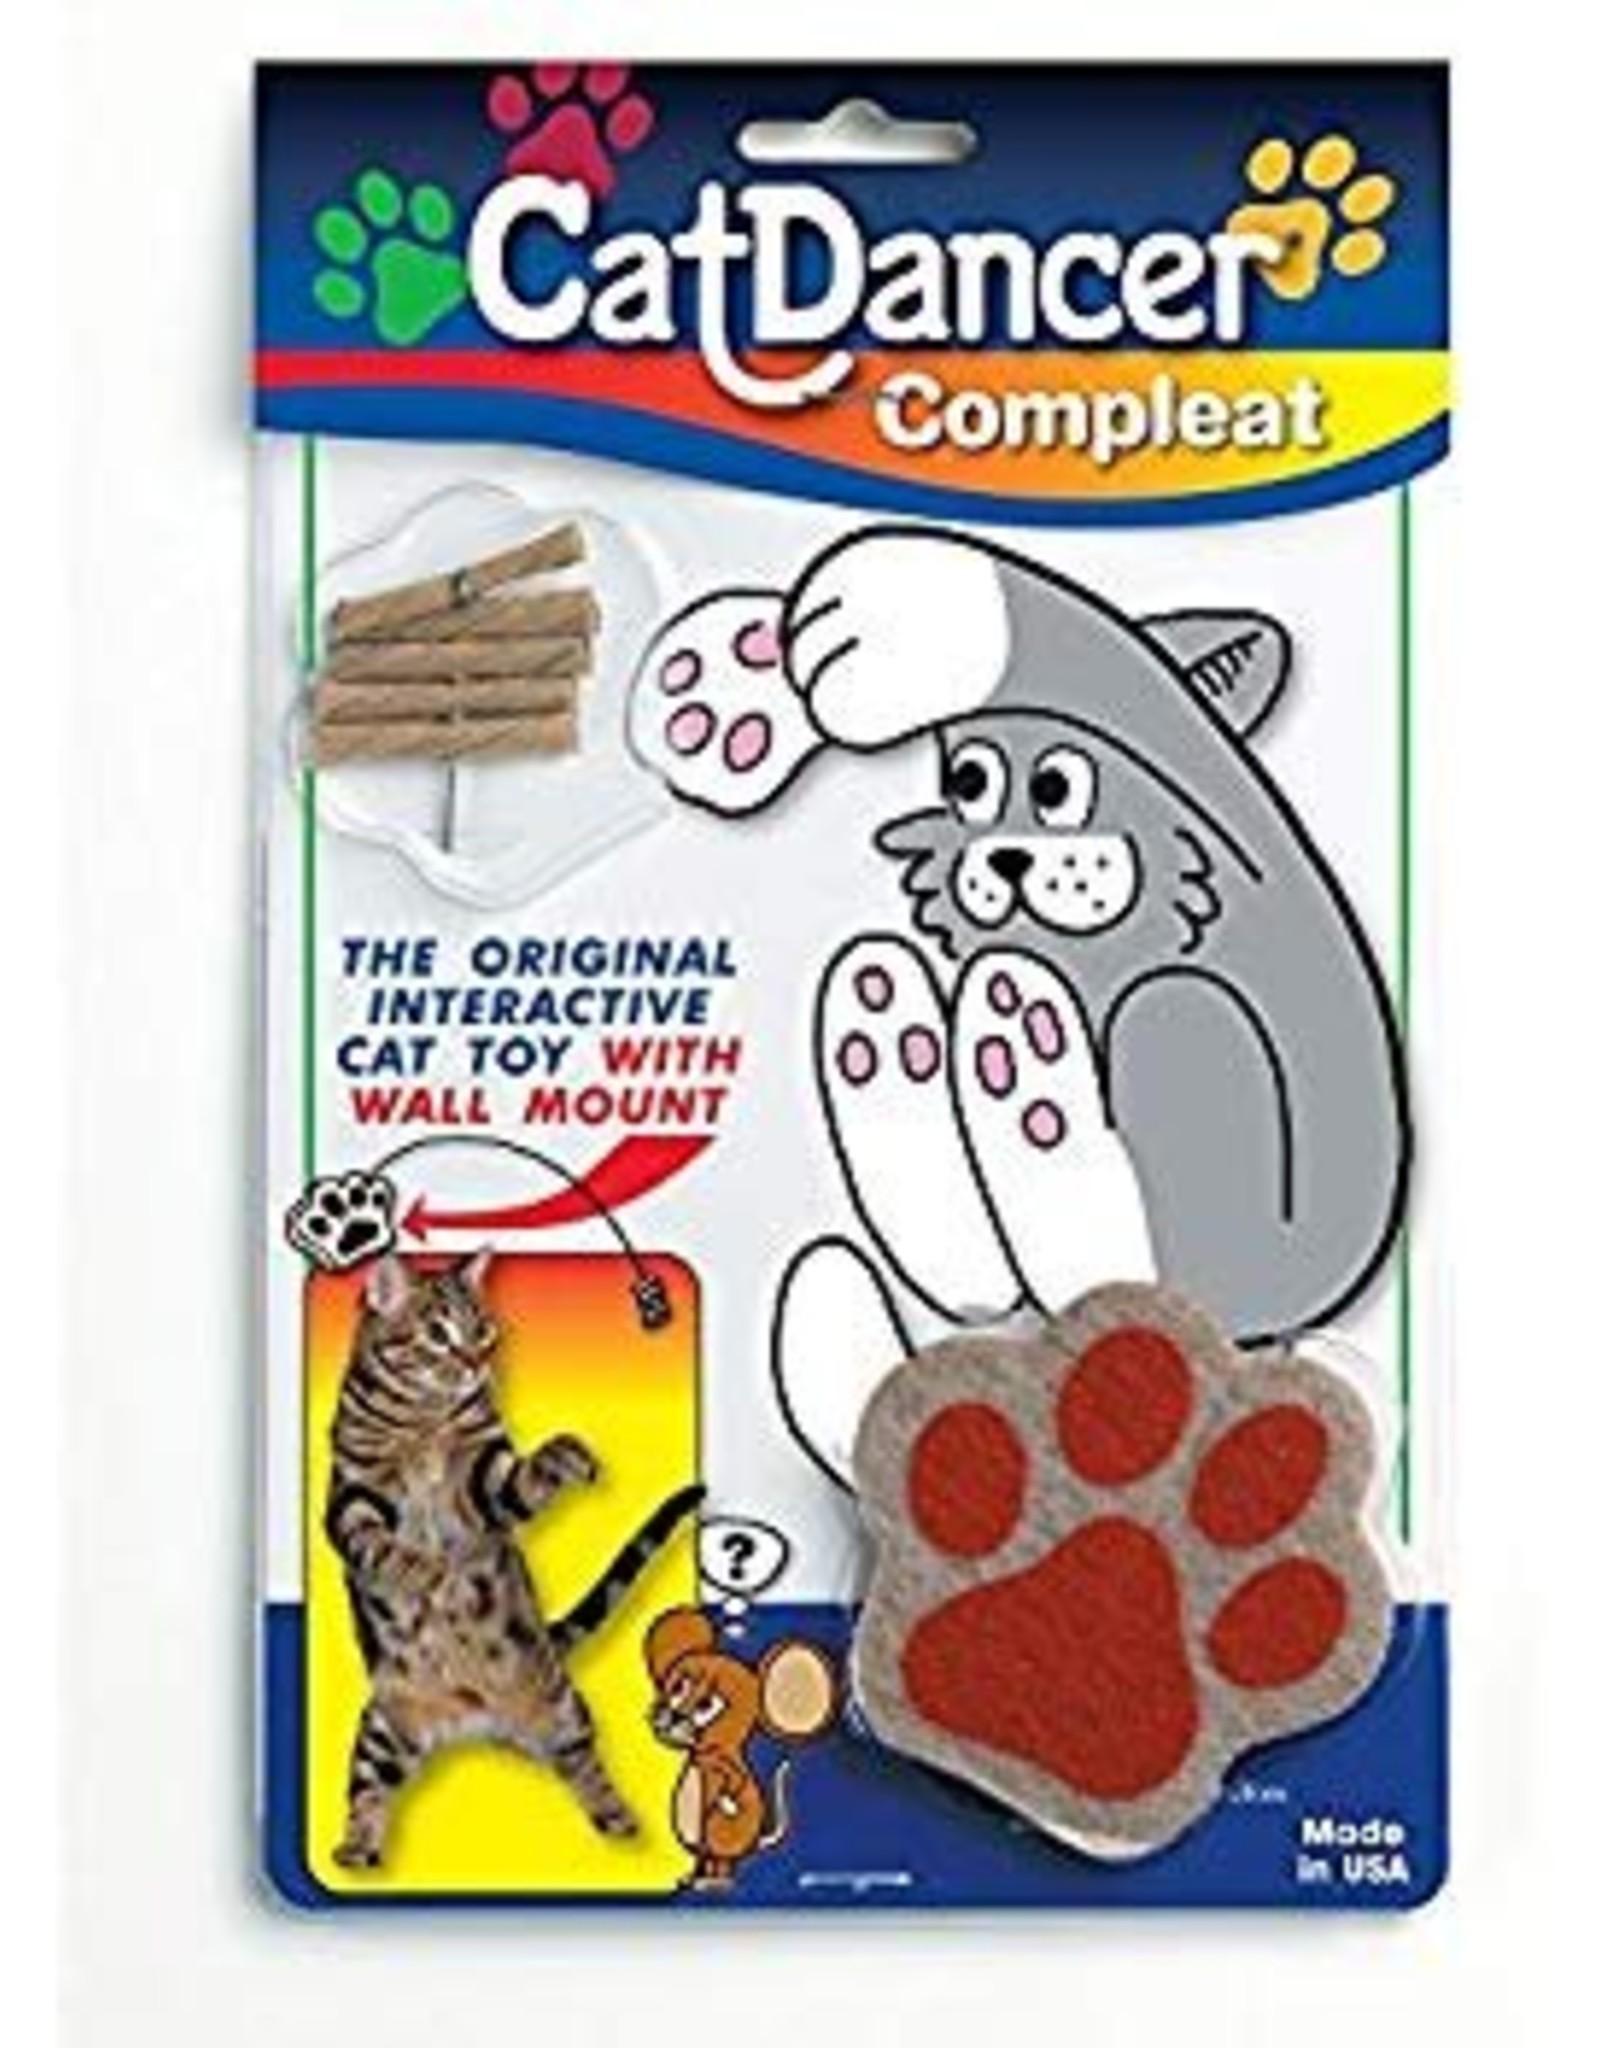 Cat Dancer Interactive Cat Toy Wall Mount